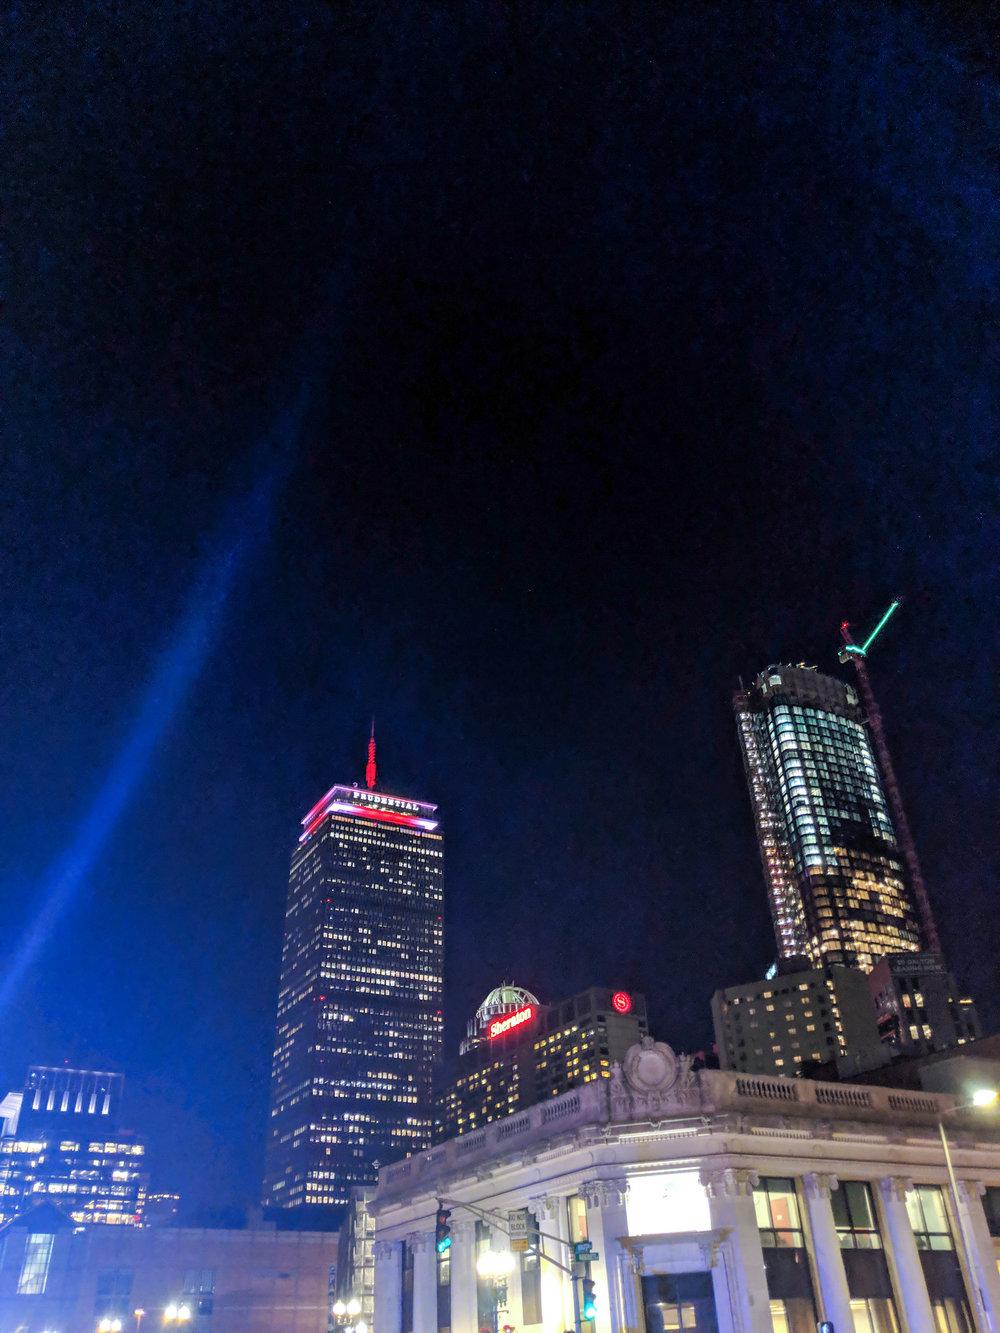 bri rinehart; boston; photography series; photography; prudential center